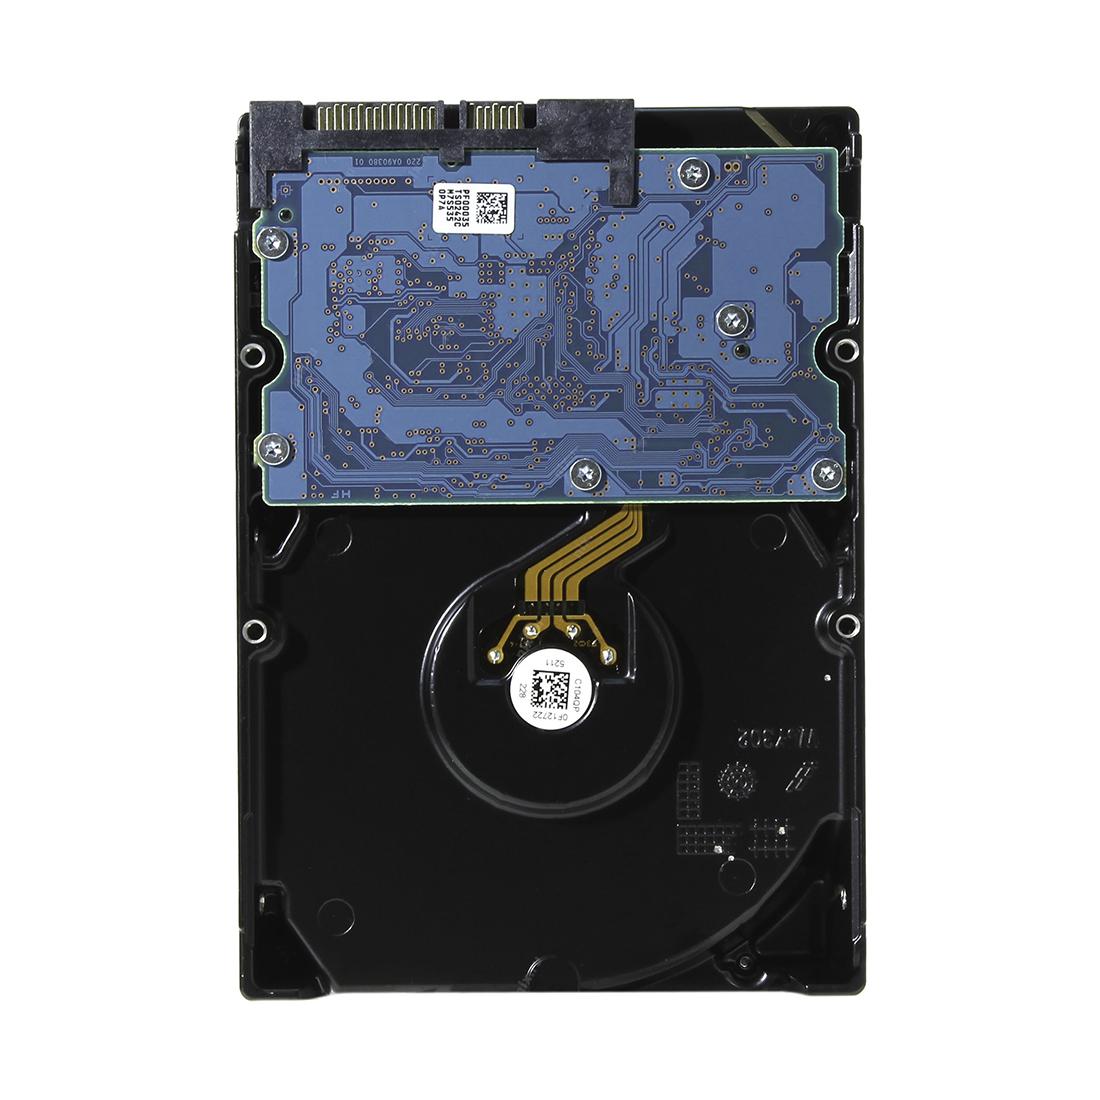 Жёсткий диск HDD 2Tb Toshiba SATA6Gb / s 7200rpm 64Mb 3,5